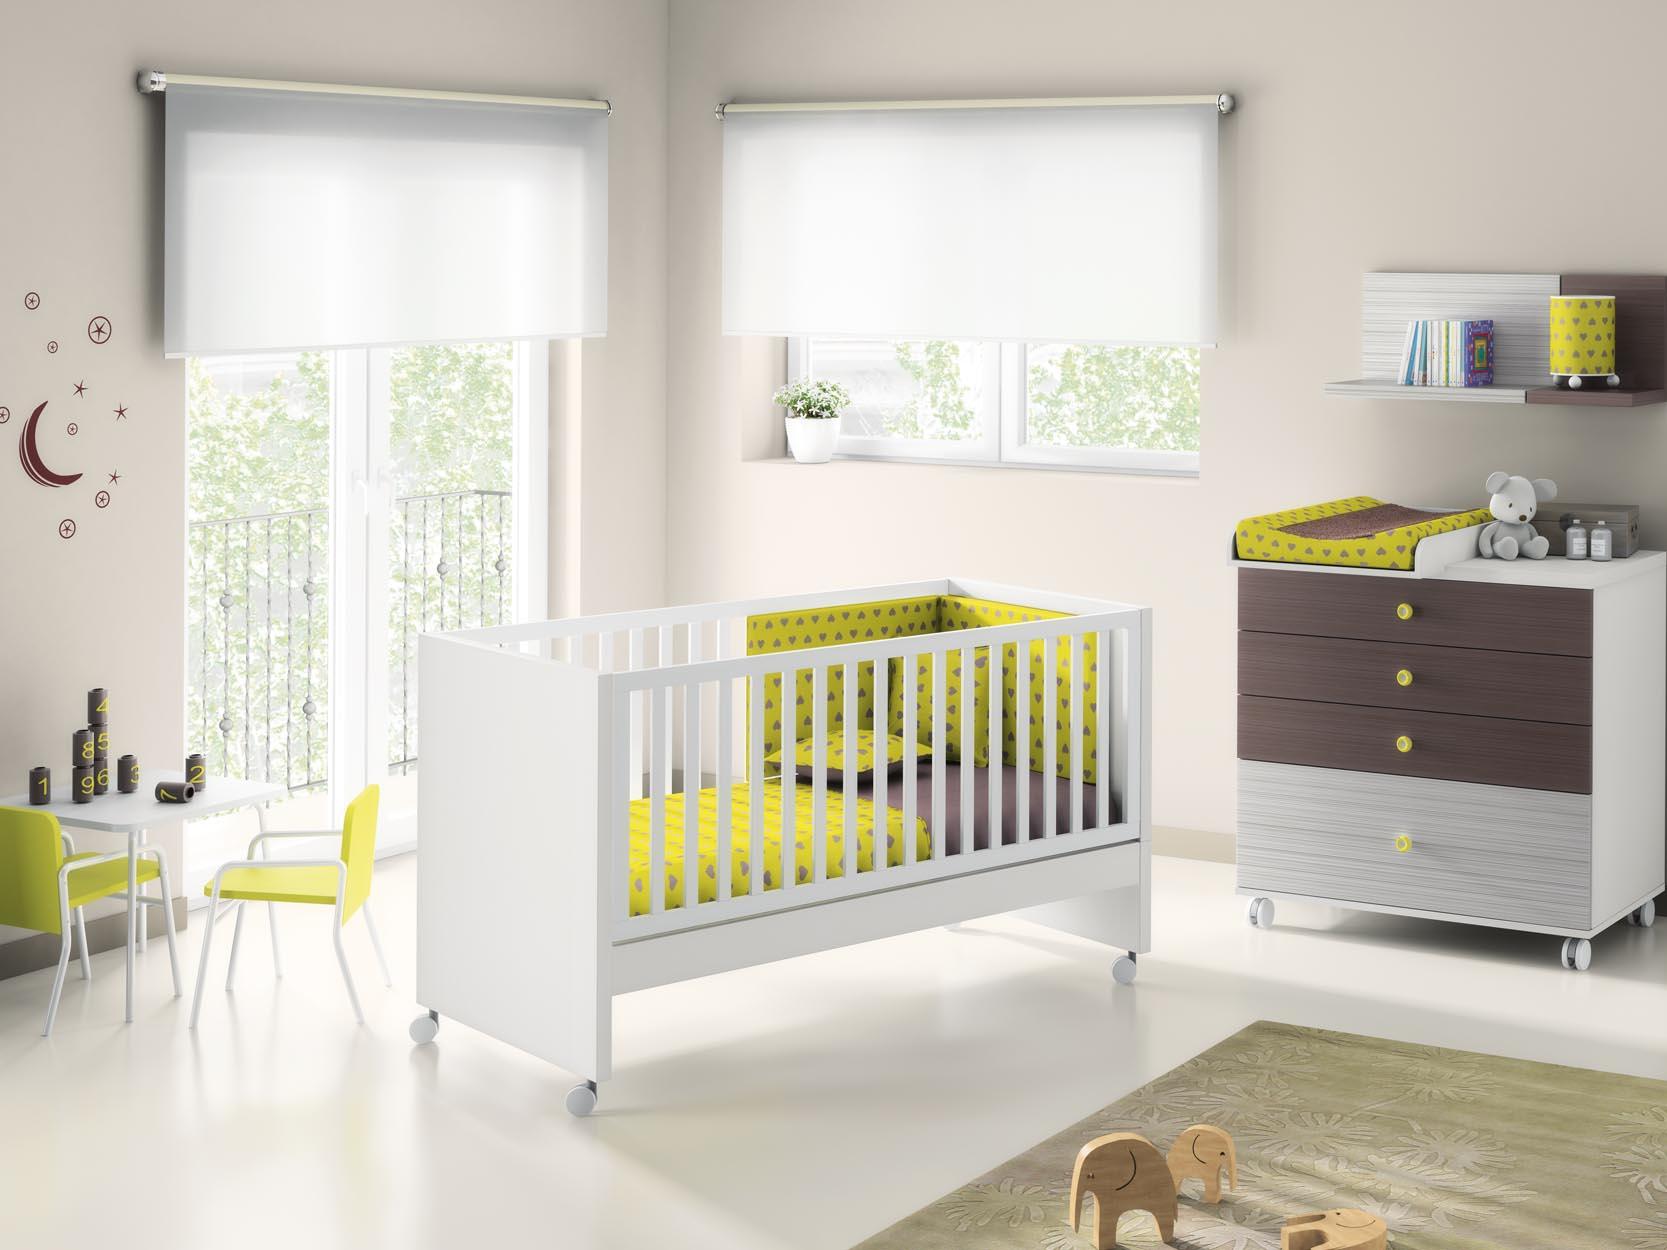 Comprar mueble infantil en Teruel